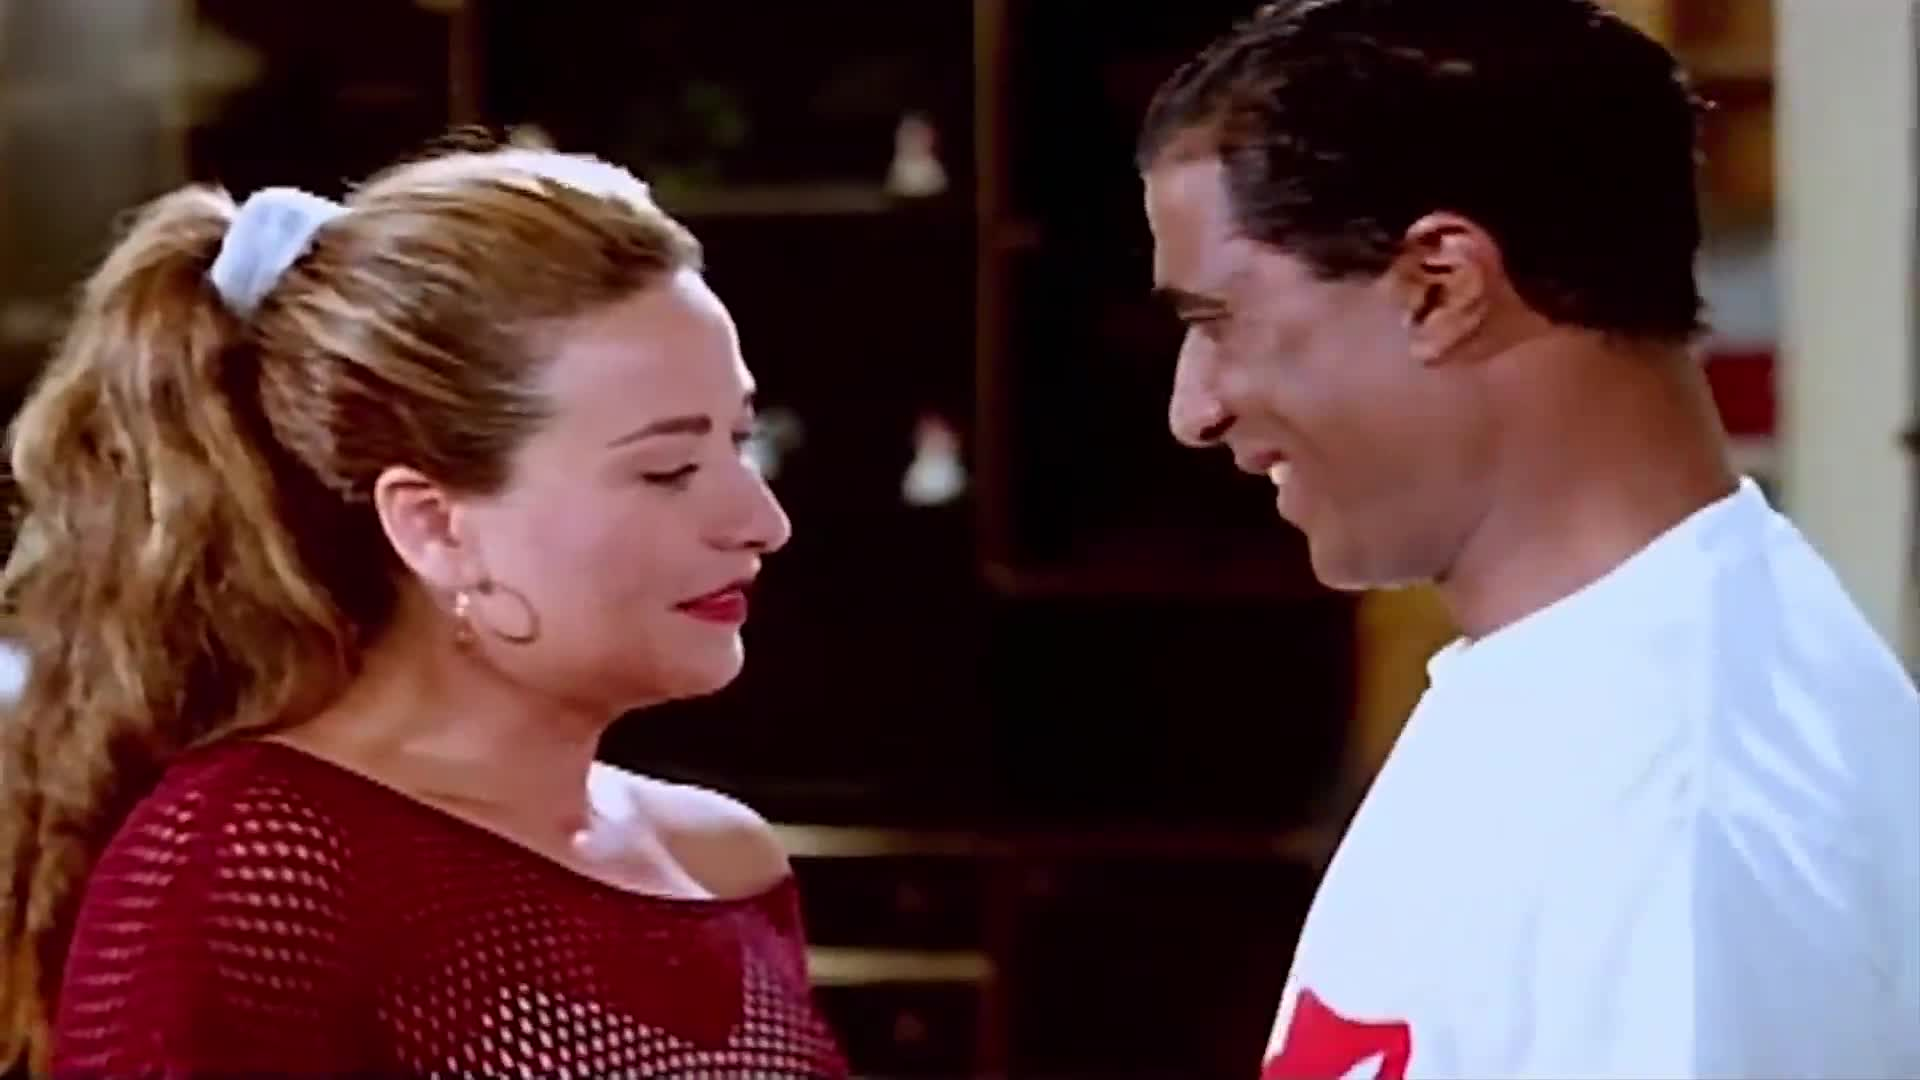 [فيلم][تورنت][تحميل][استاكوزا][1996][1080p][Web-DL] 17 arabp2p.com